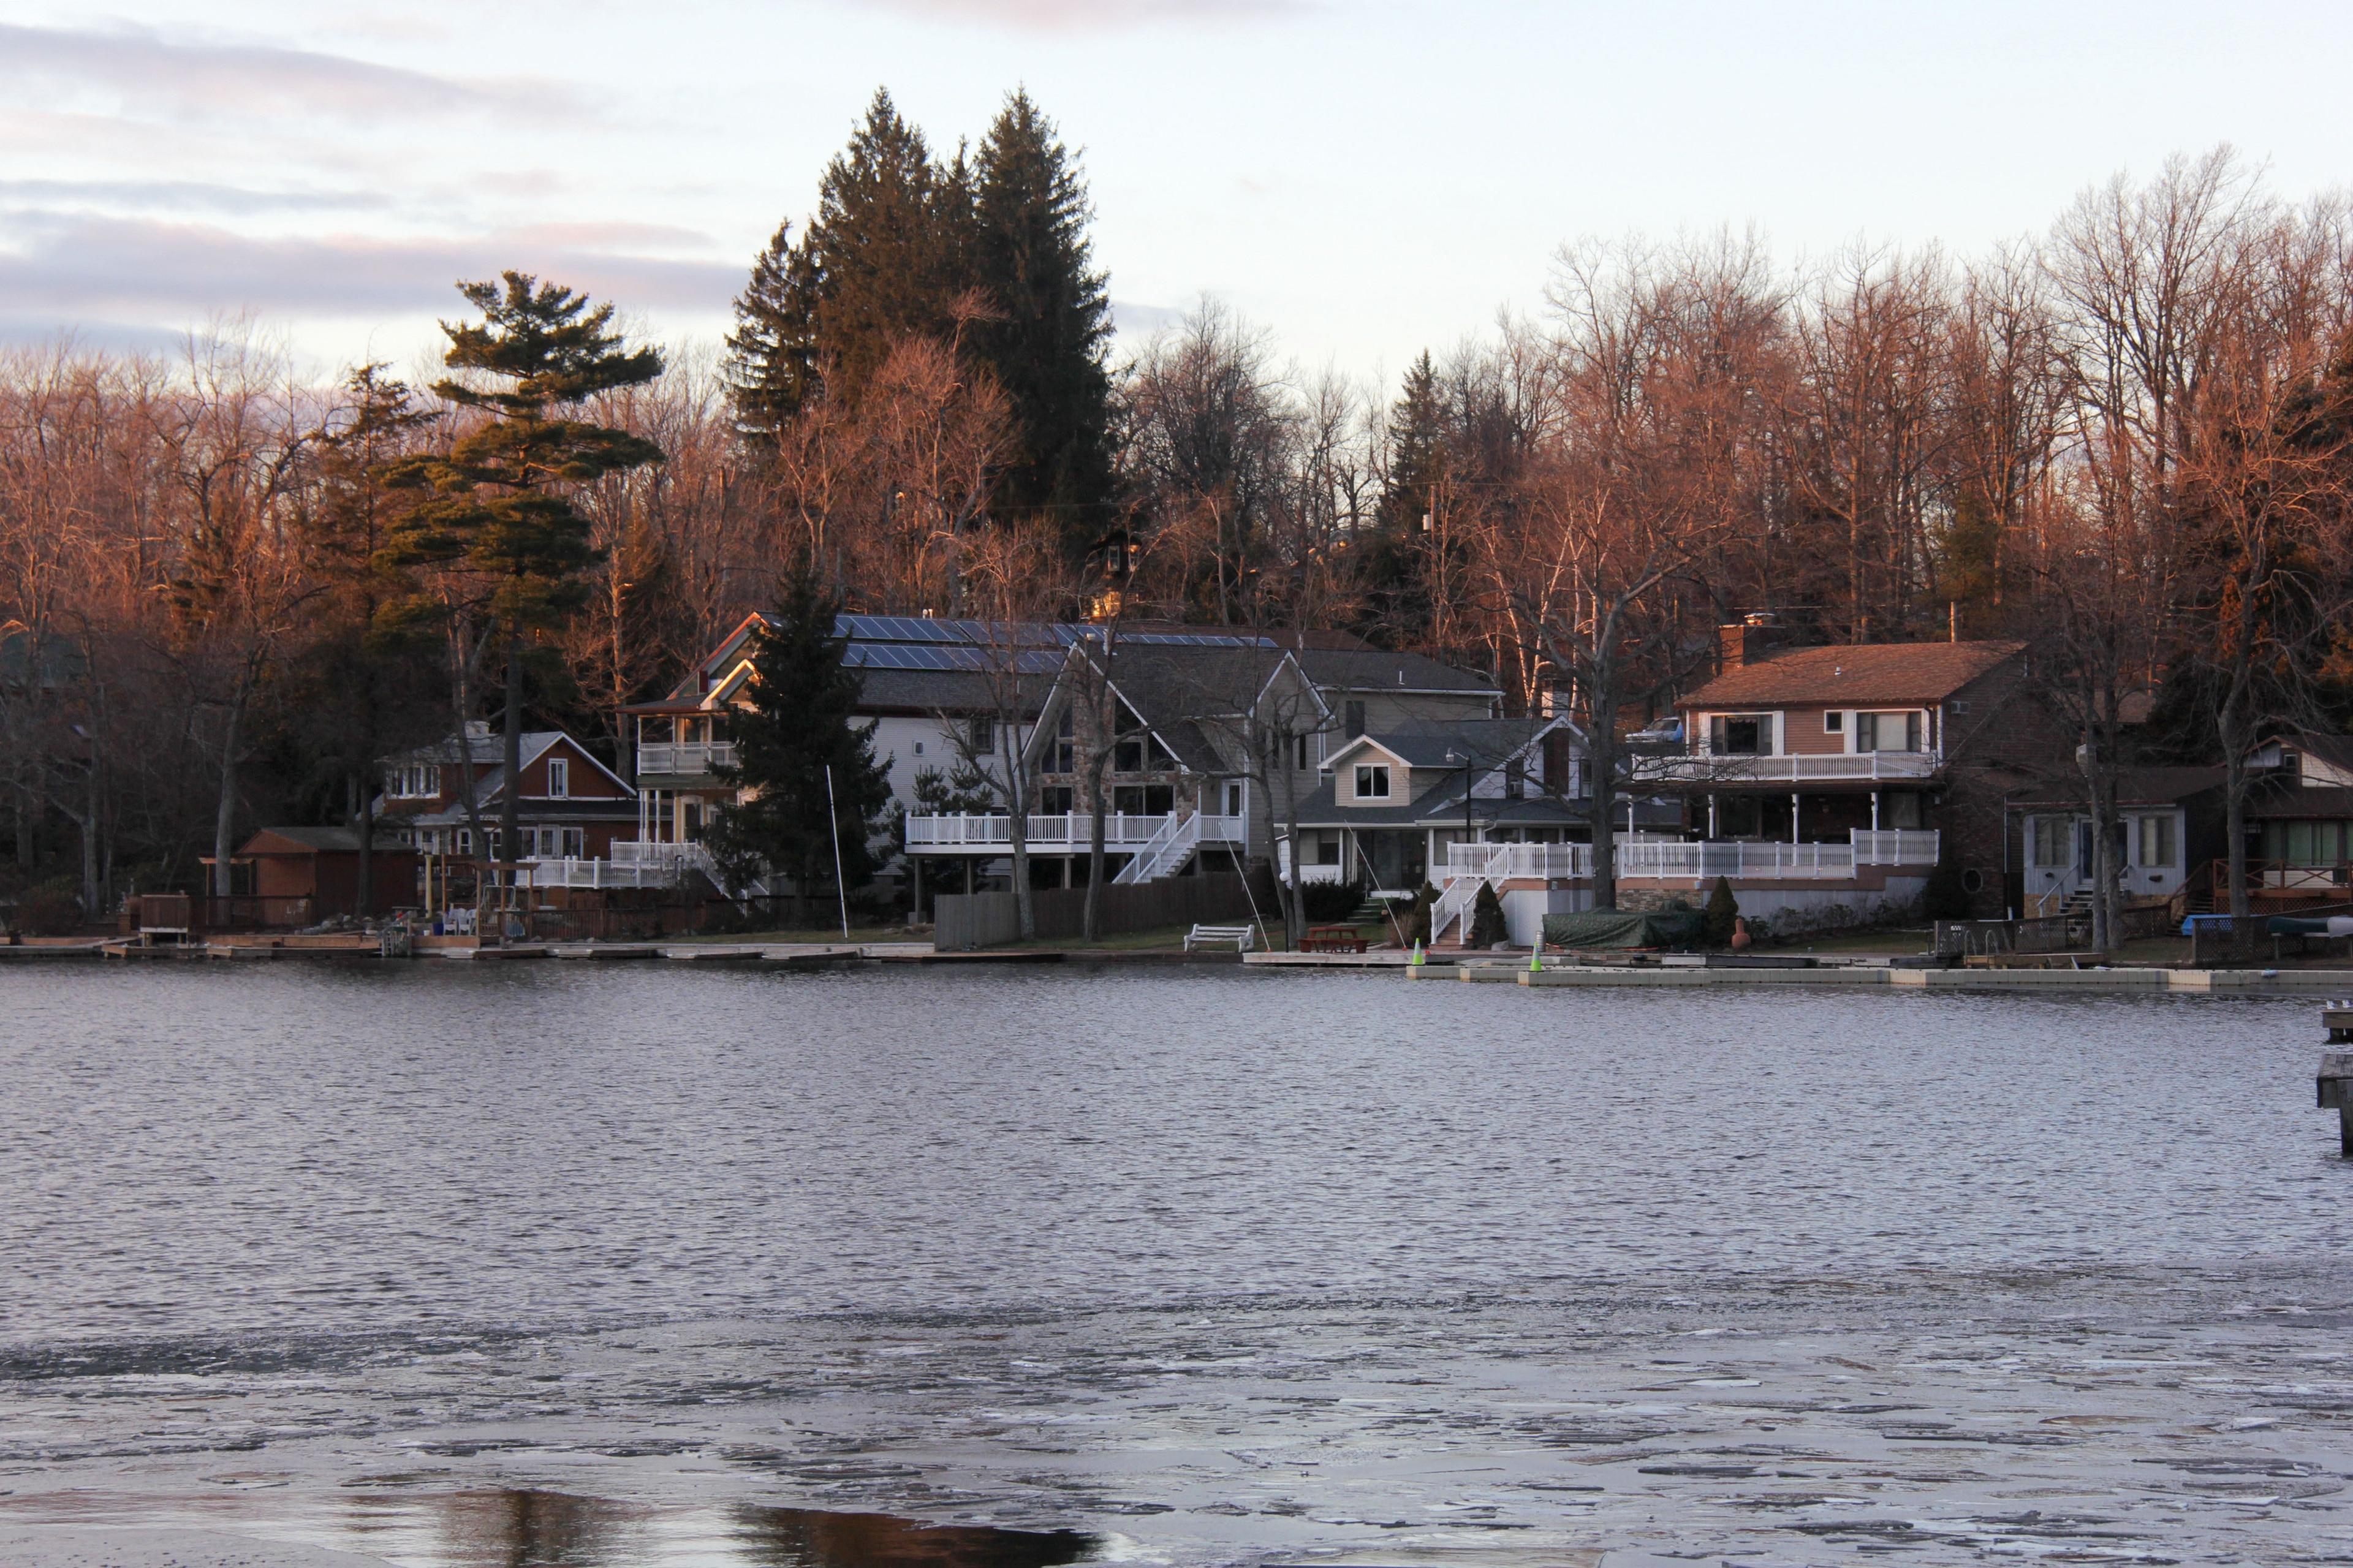 Pocono Lake, Pennsylvania, United States of America